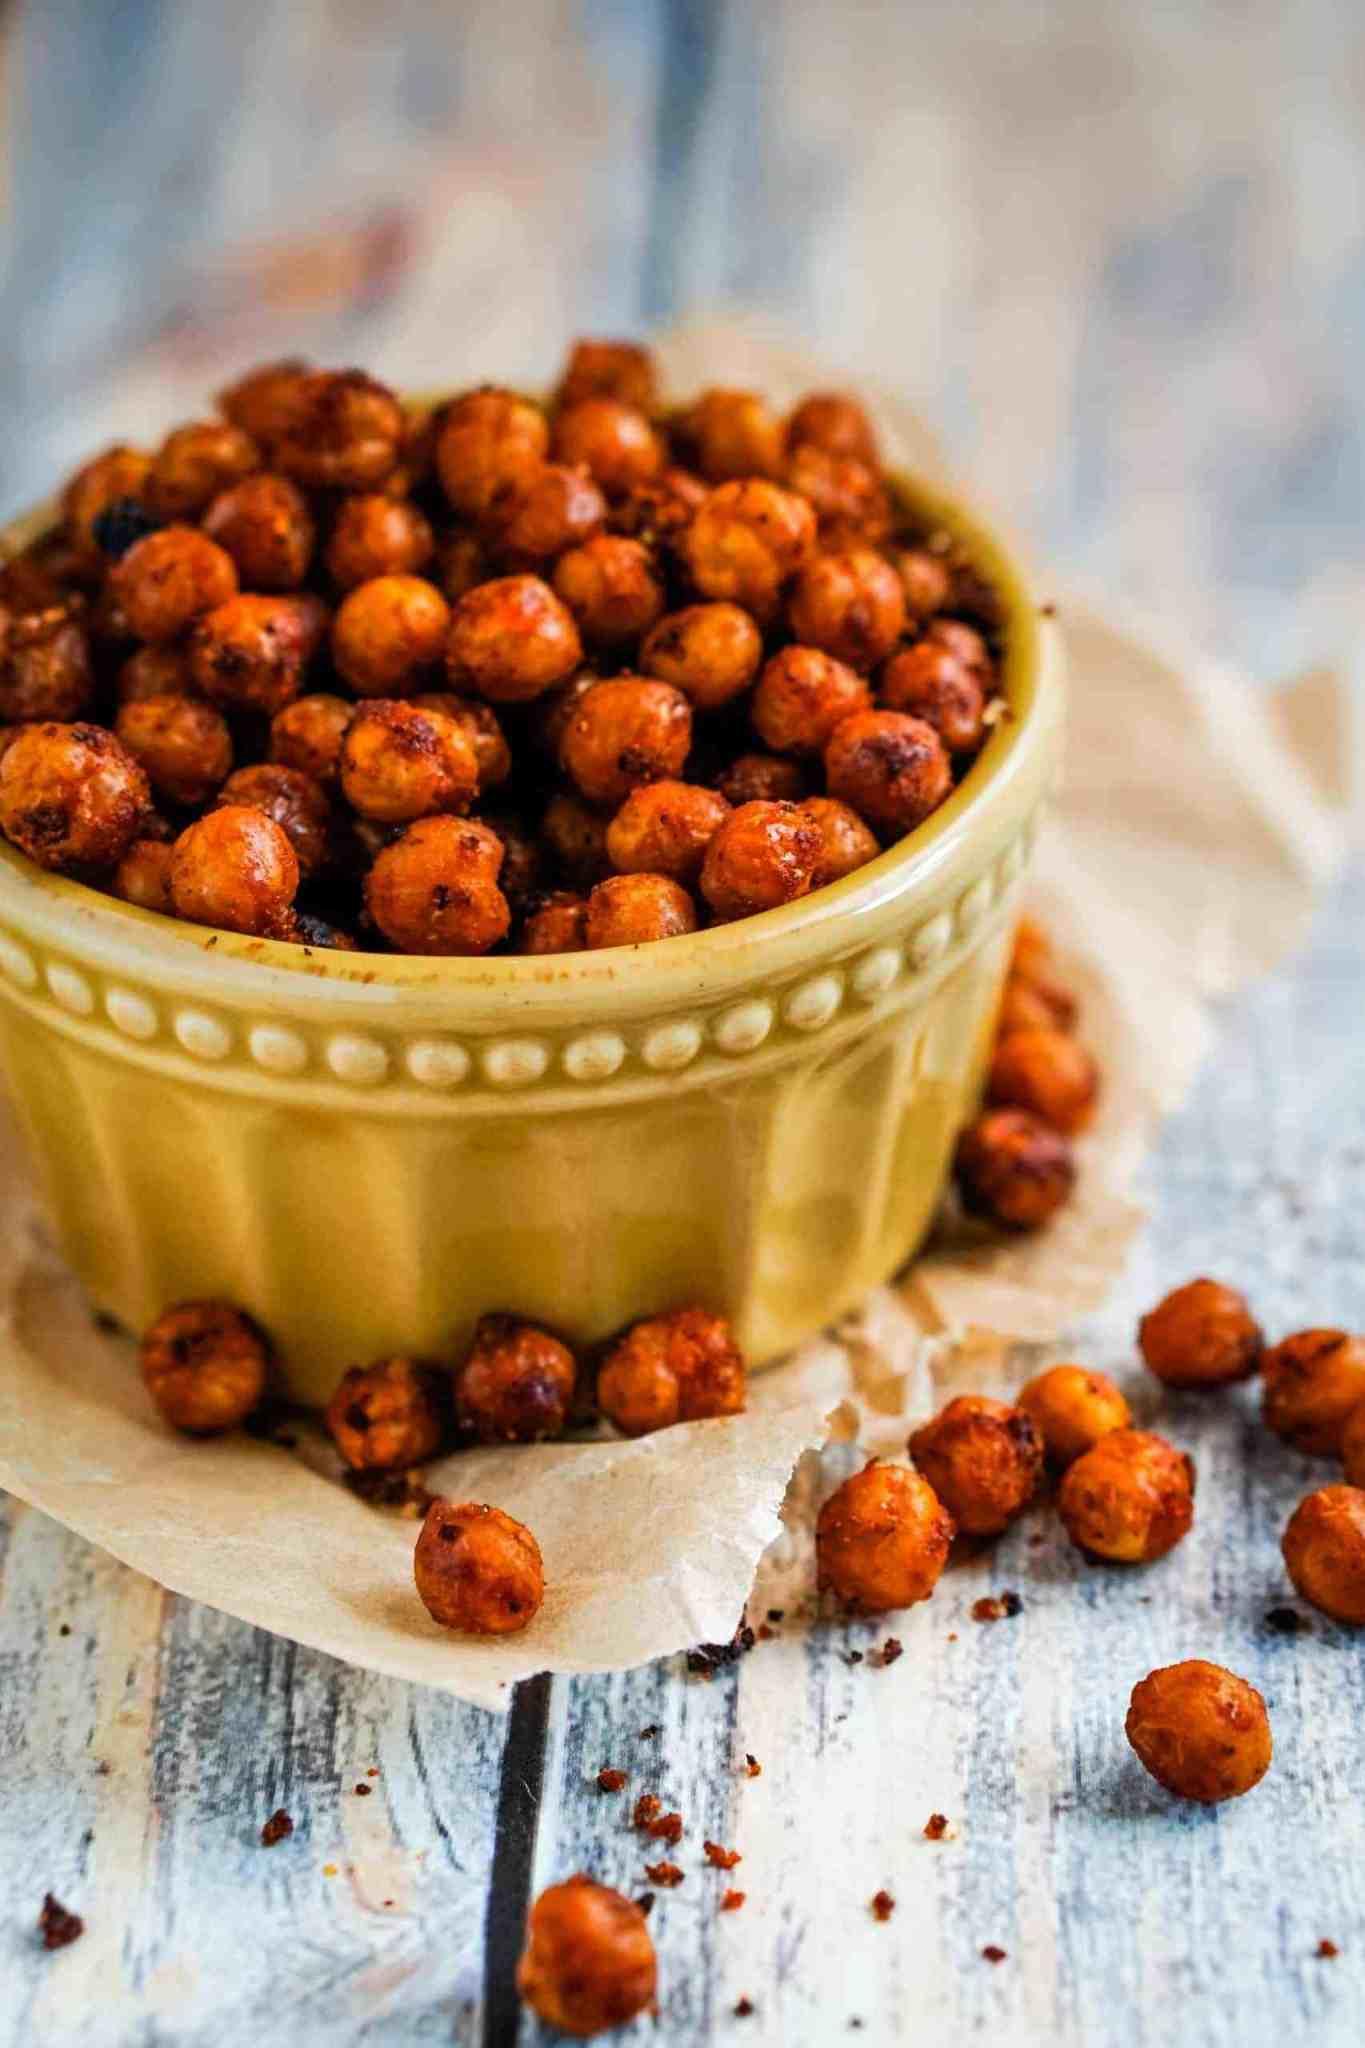 chickpea recipes - roasted chickpeas